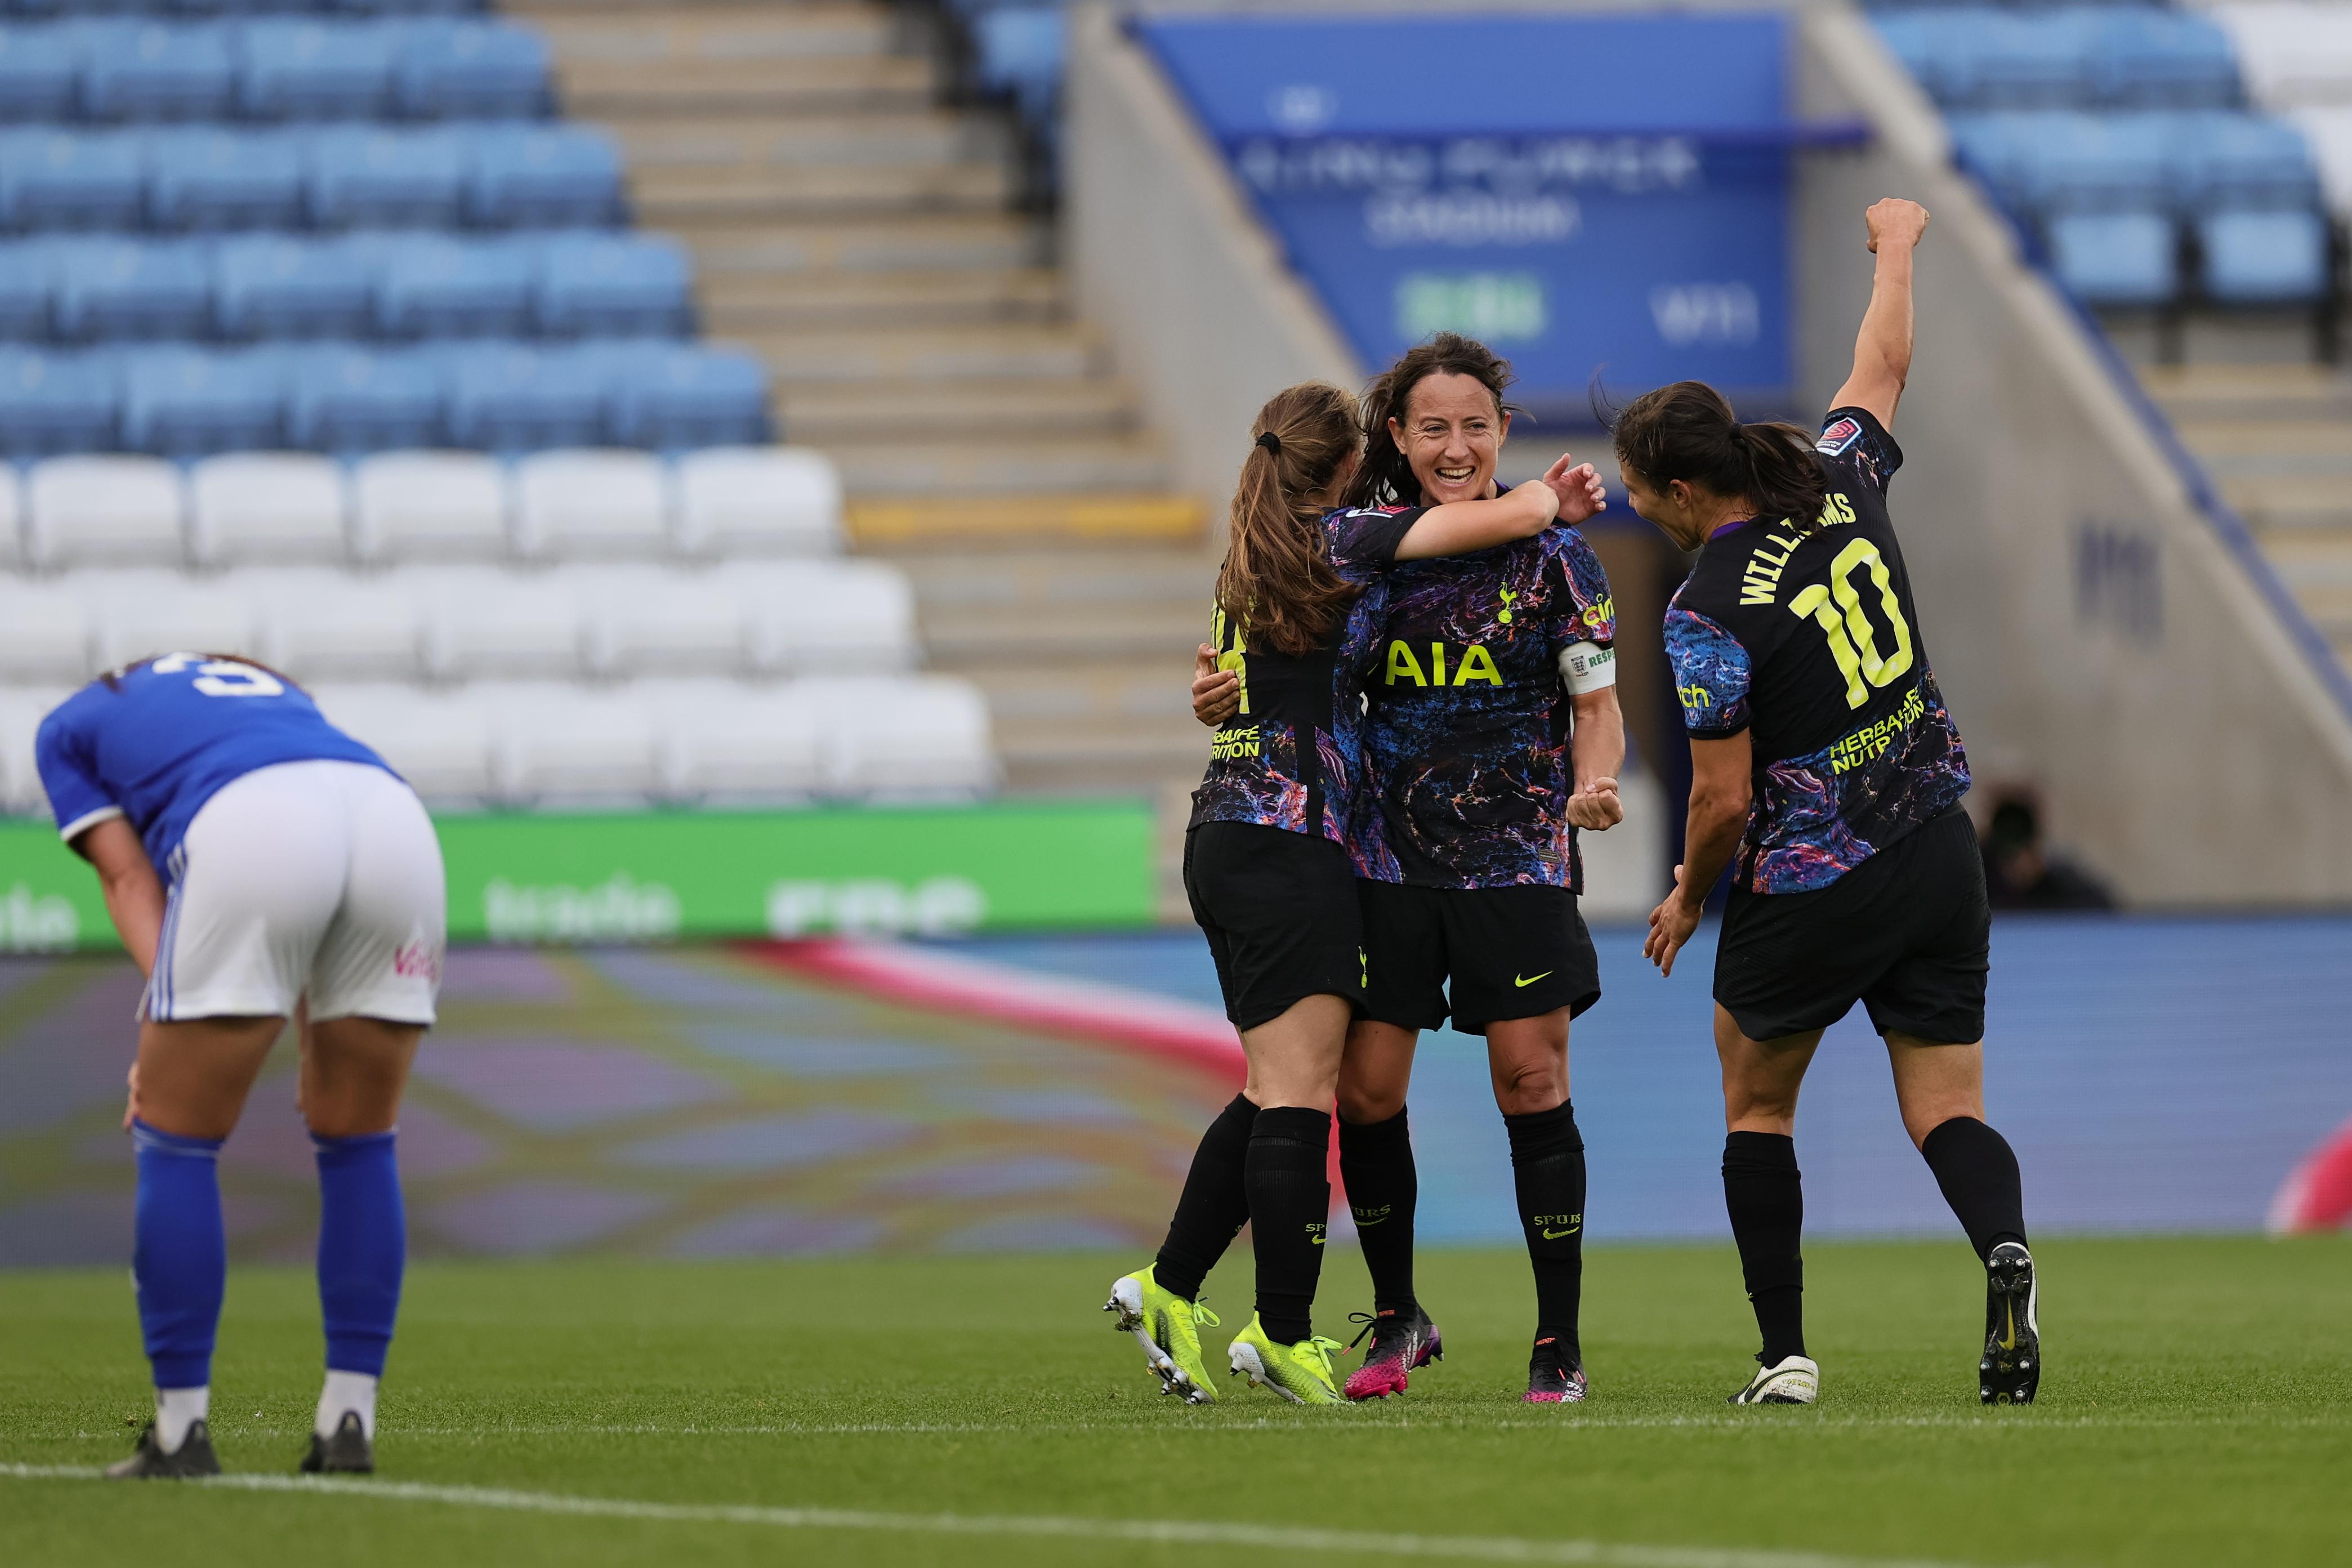 Leicester City v Tottenham Hotspur - FA Women's Super League